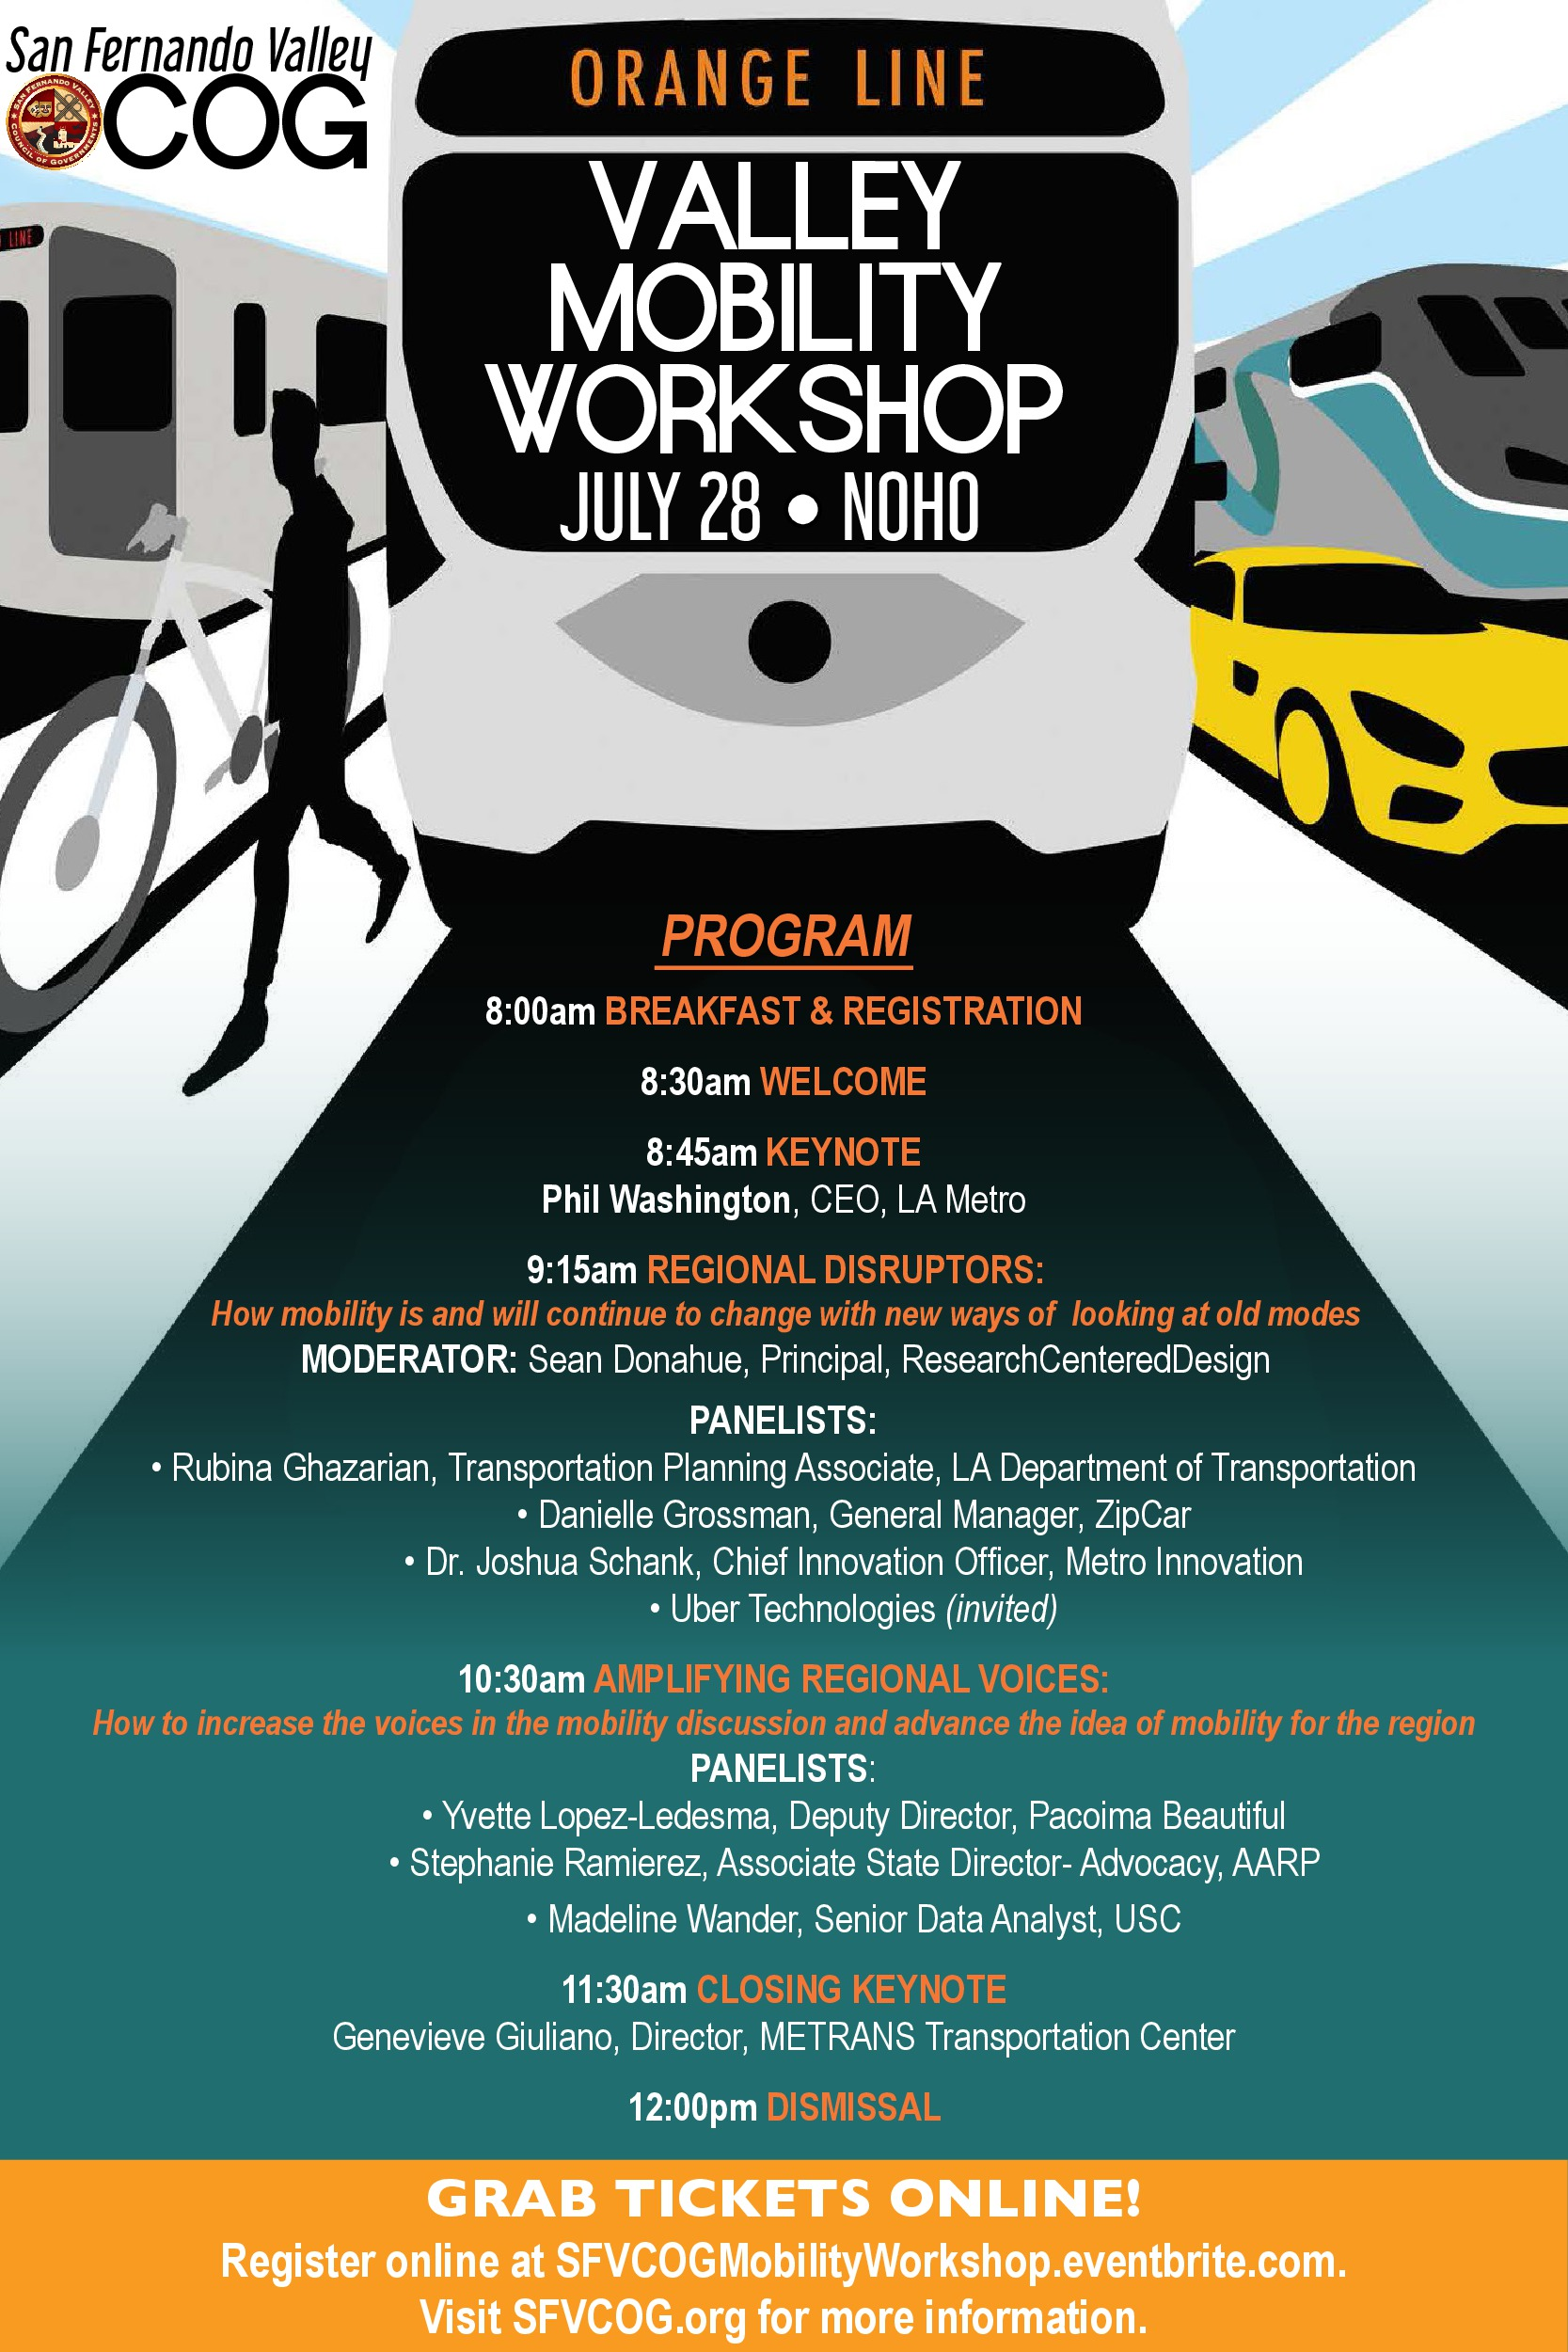 MobilityWorkshopCOGflyer-page-0.jpg